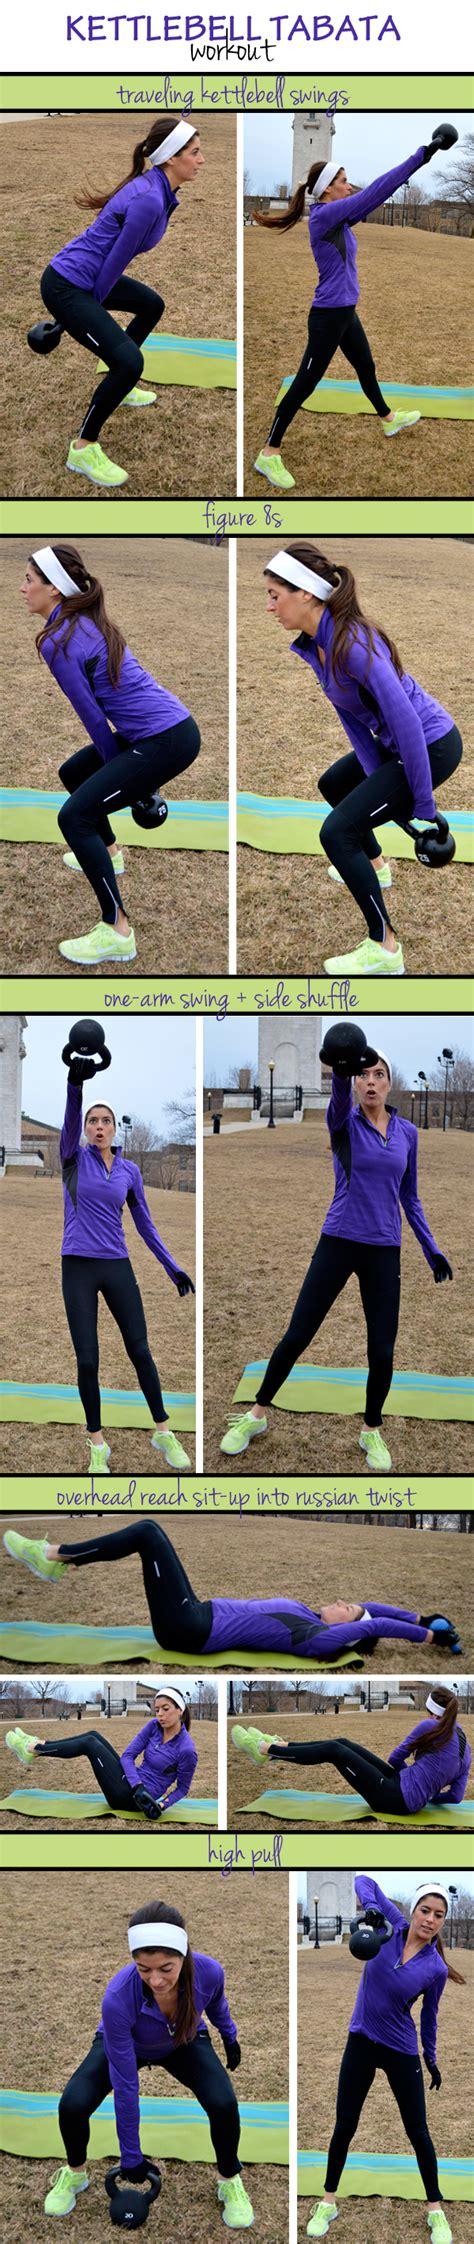 kettlebell swing tabata kettlebell tabata workout pumps iron